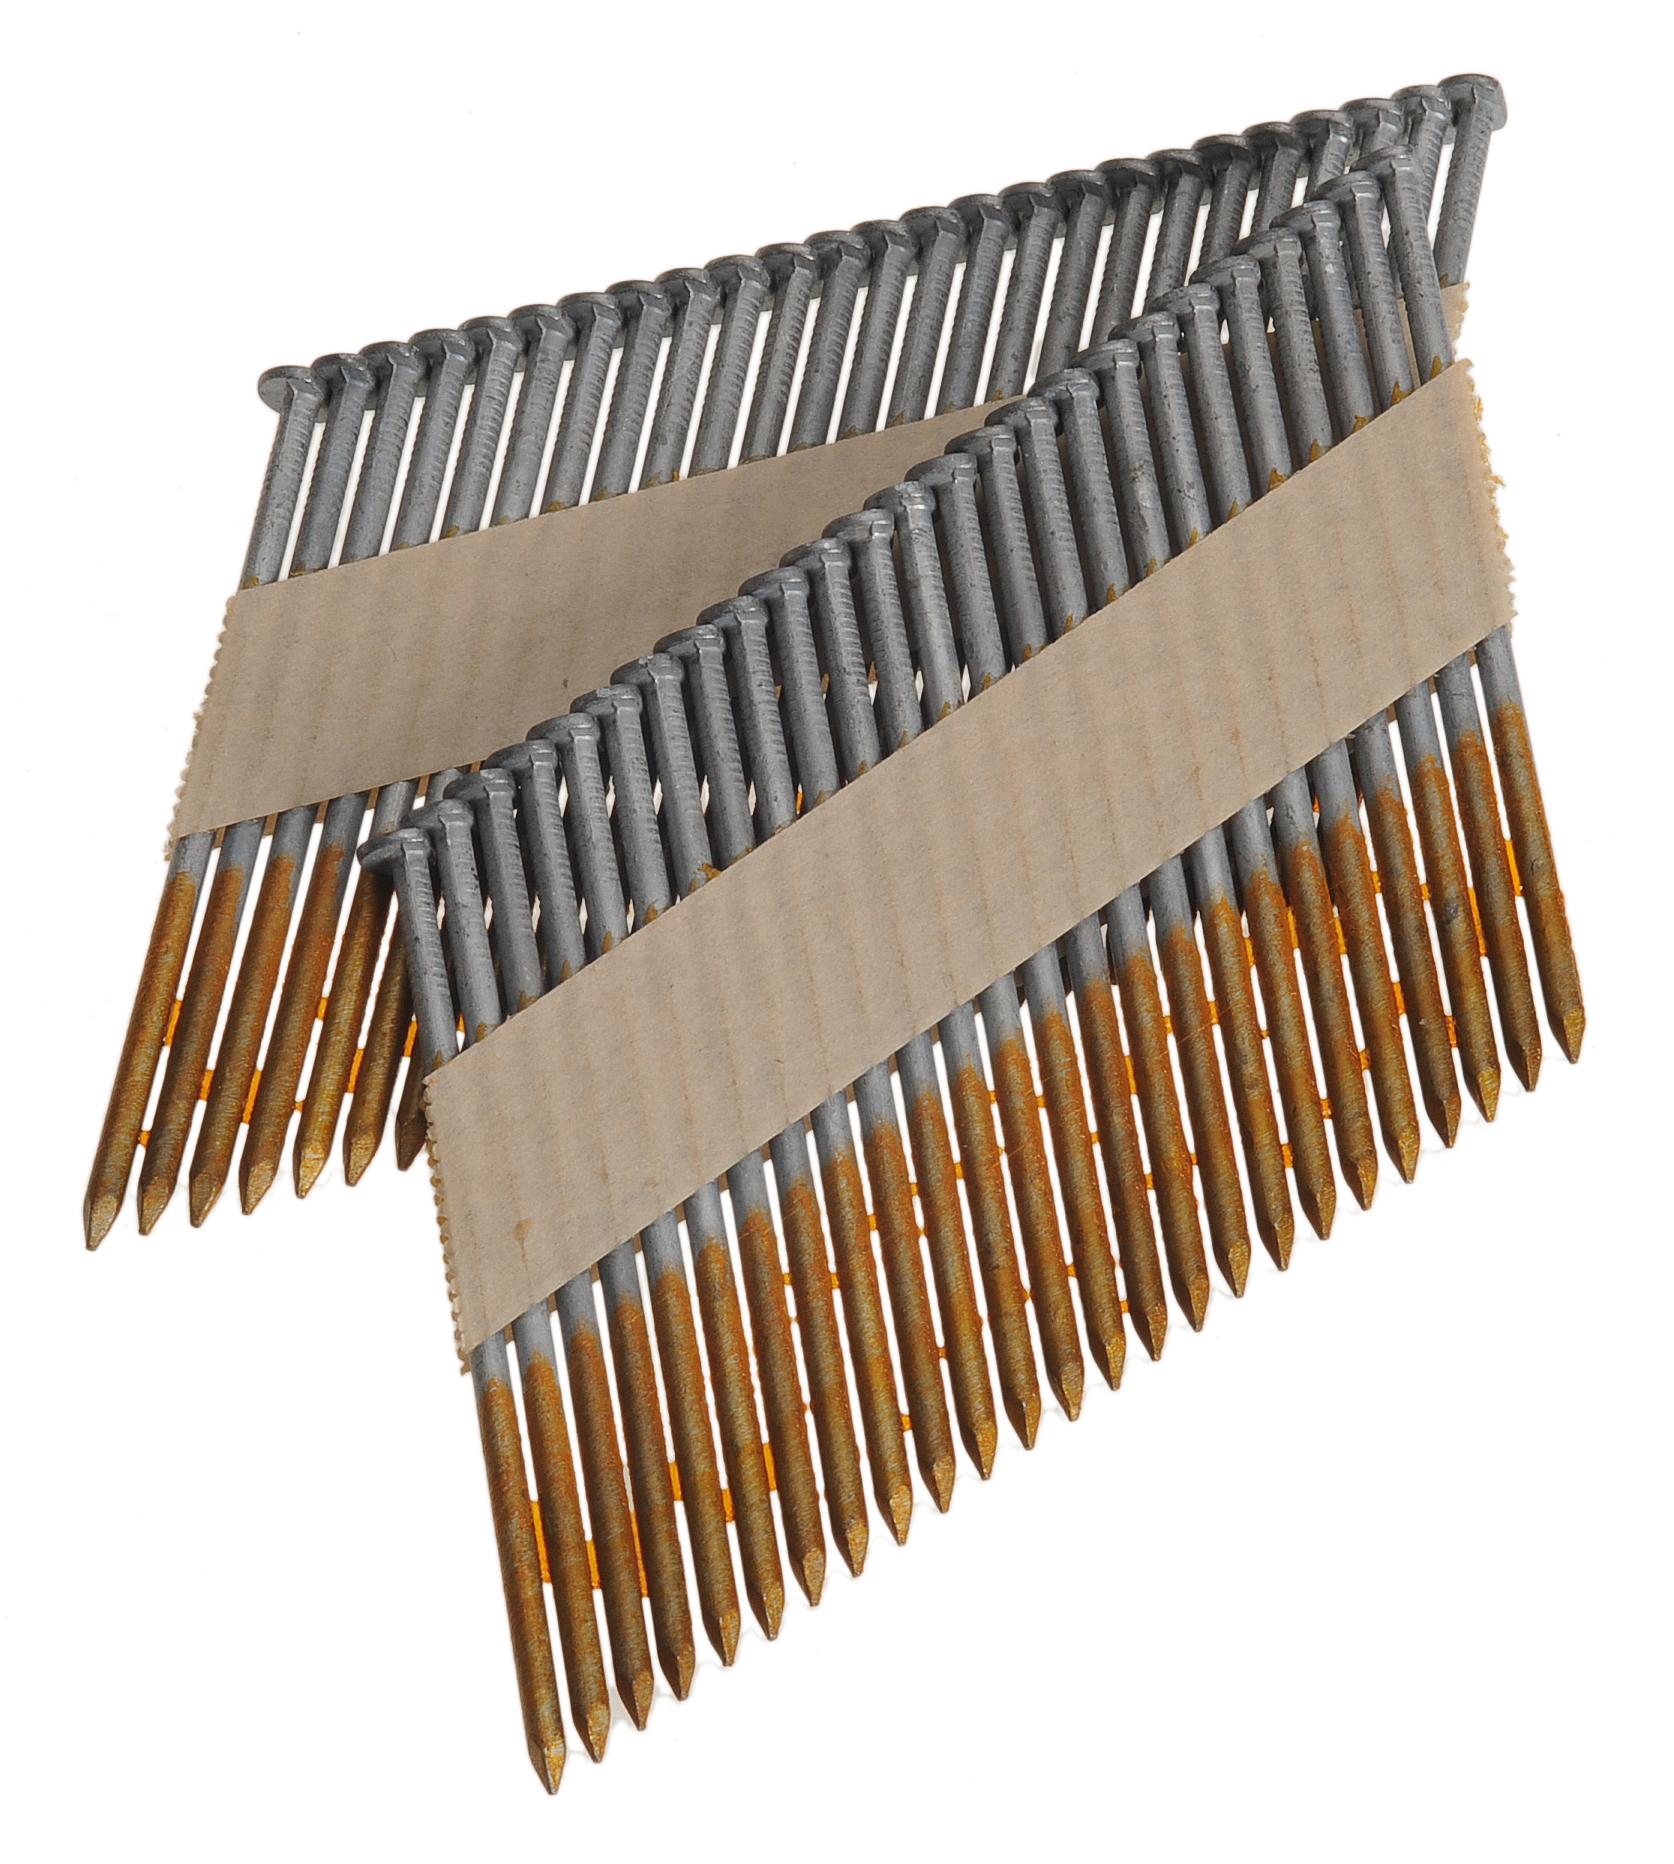 Stripnagels 3.1x70mm Glad blank 34° D-kop Doos 2000 stuks